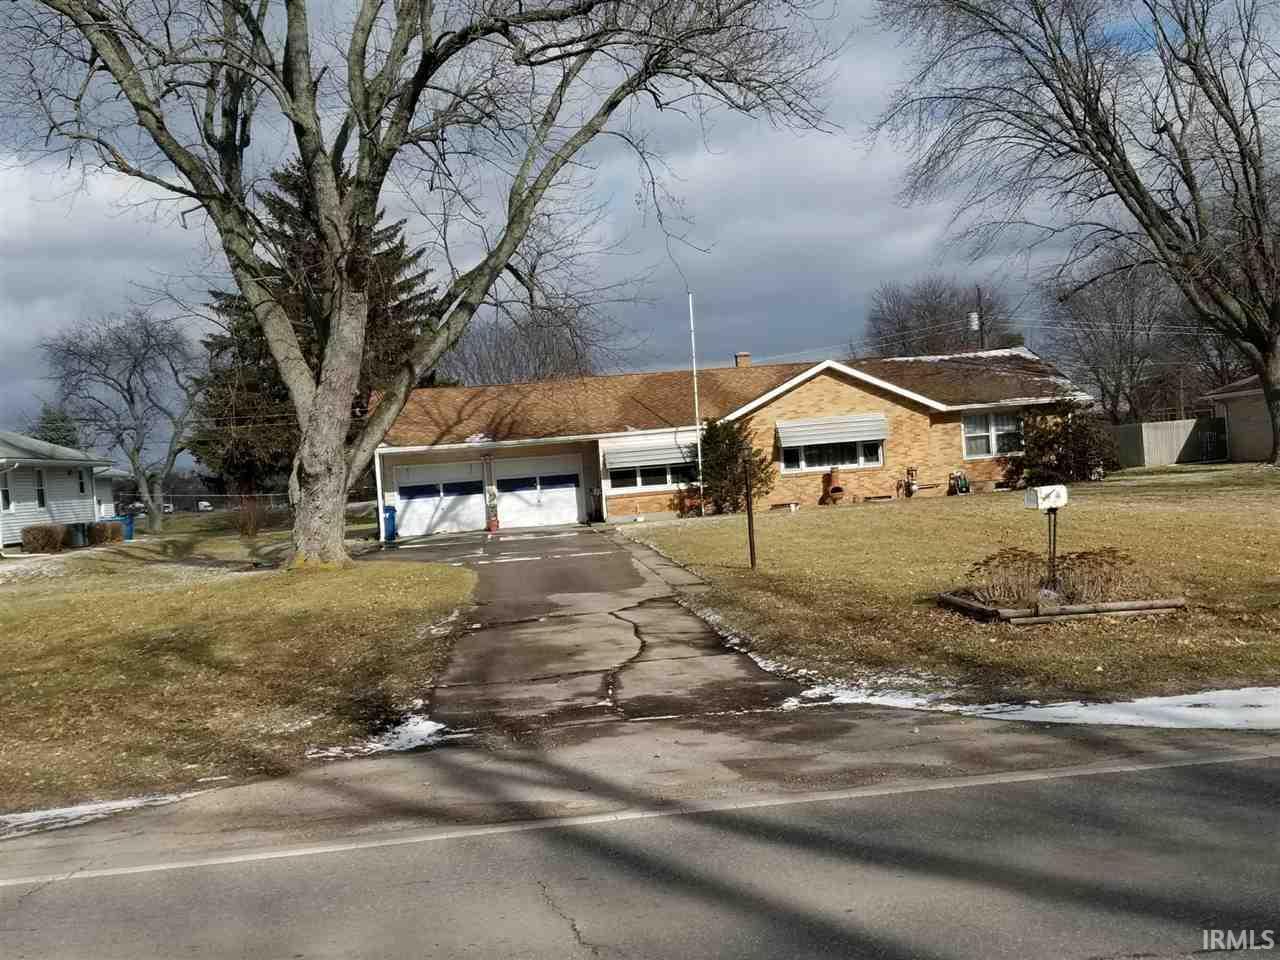 24597  County Road 20 Elkhart, IN 46517